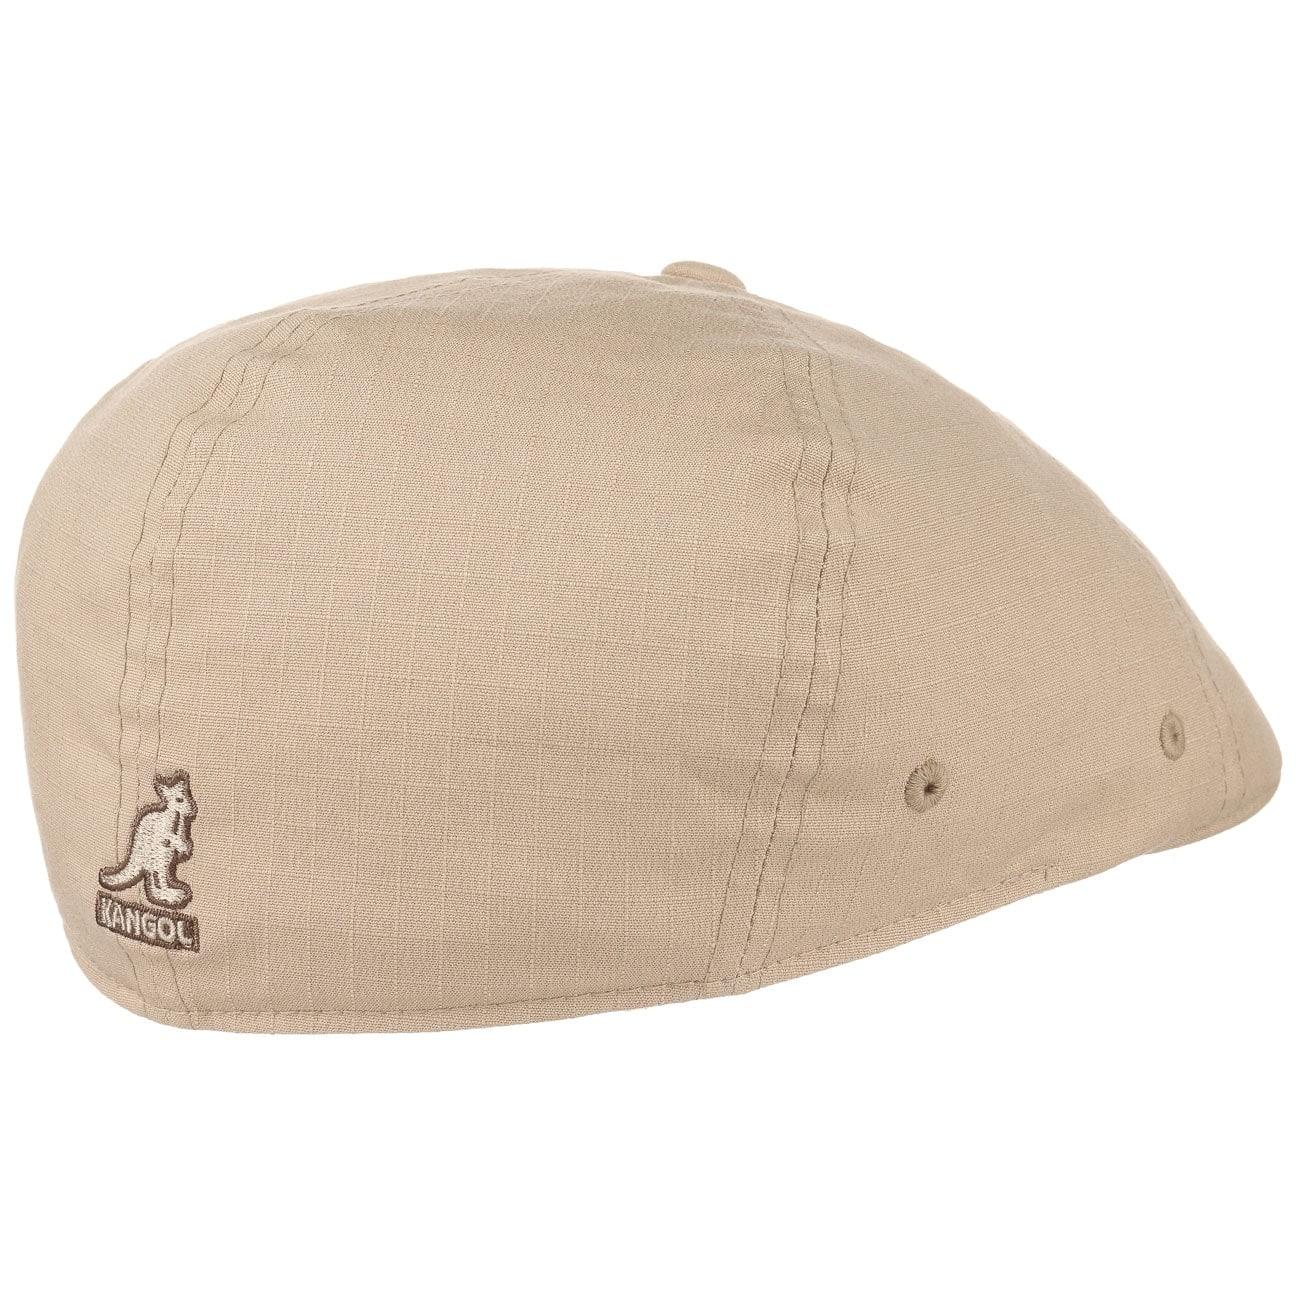 21115fad9e0fc Gorra Ripstop 504 Gatsby by Kangol - Gorras - sombreroshop.es